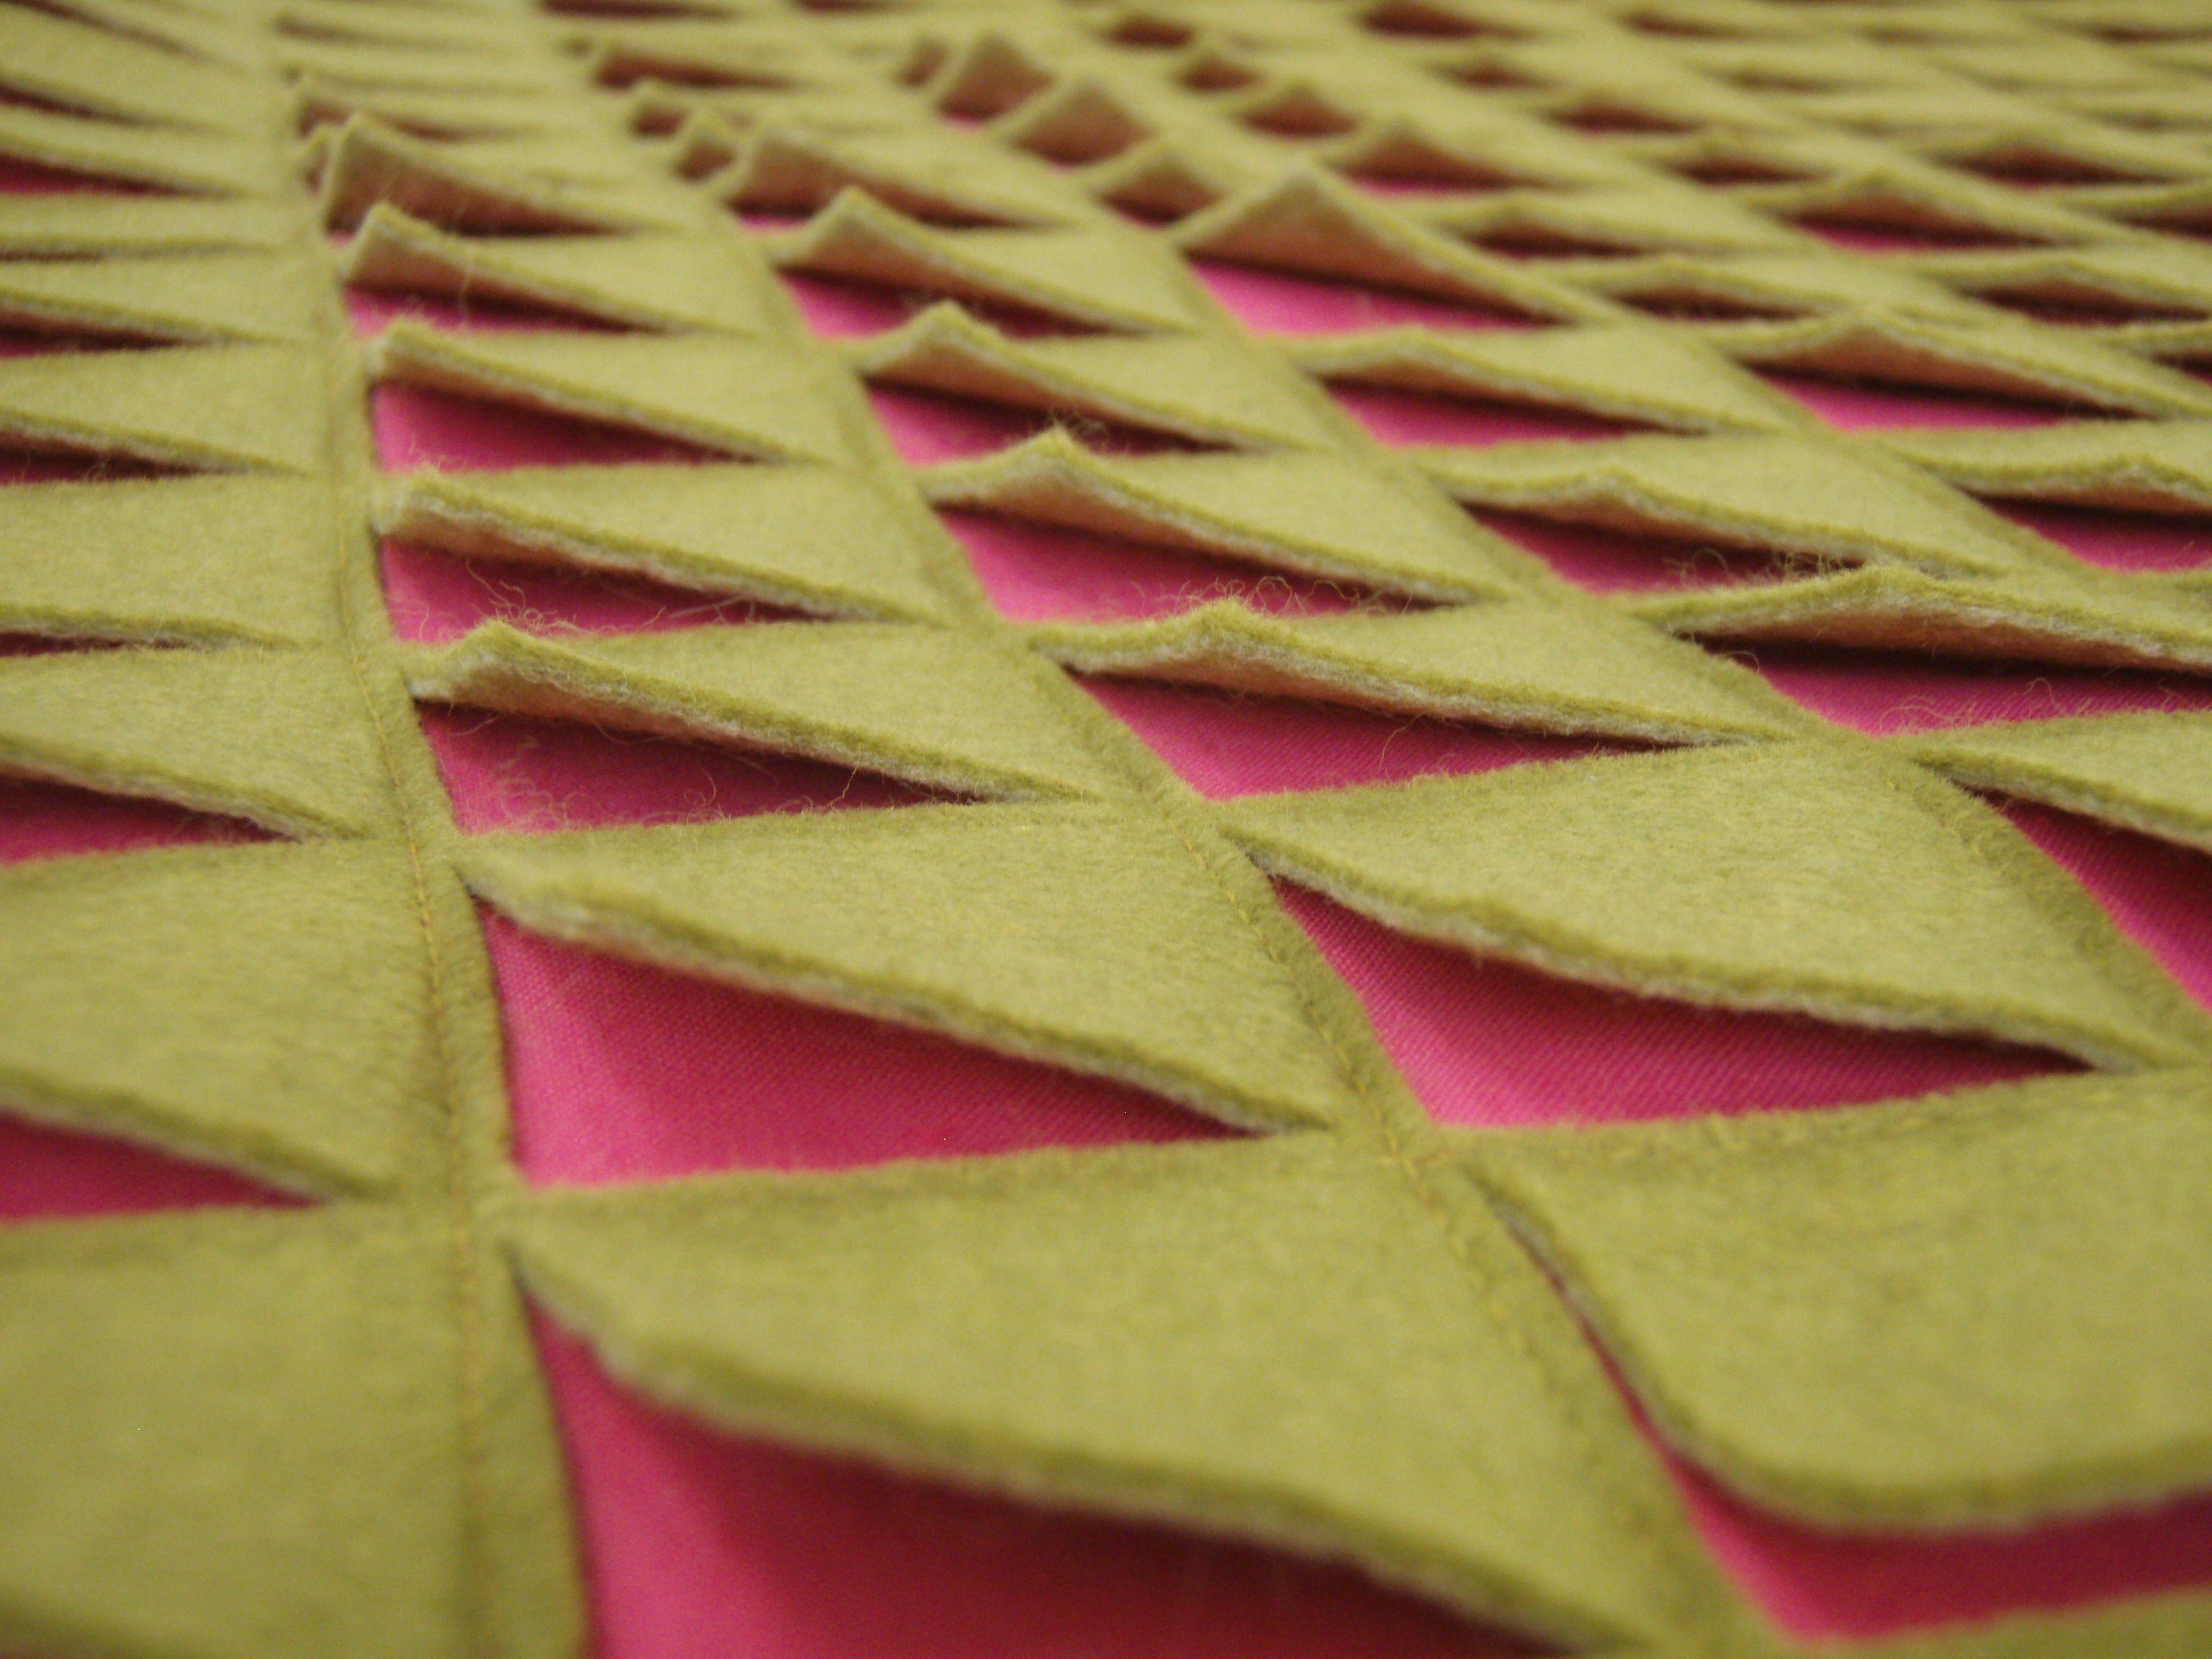 Fabric Manipulation Ruth Singer